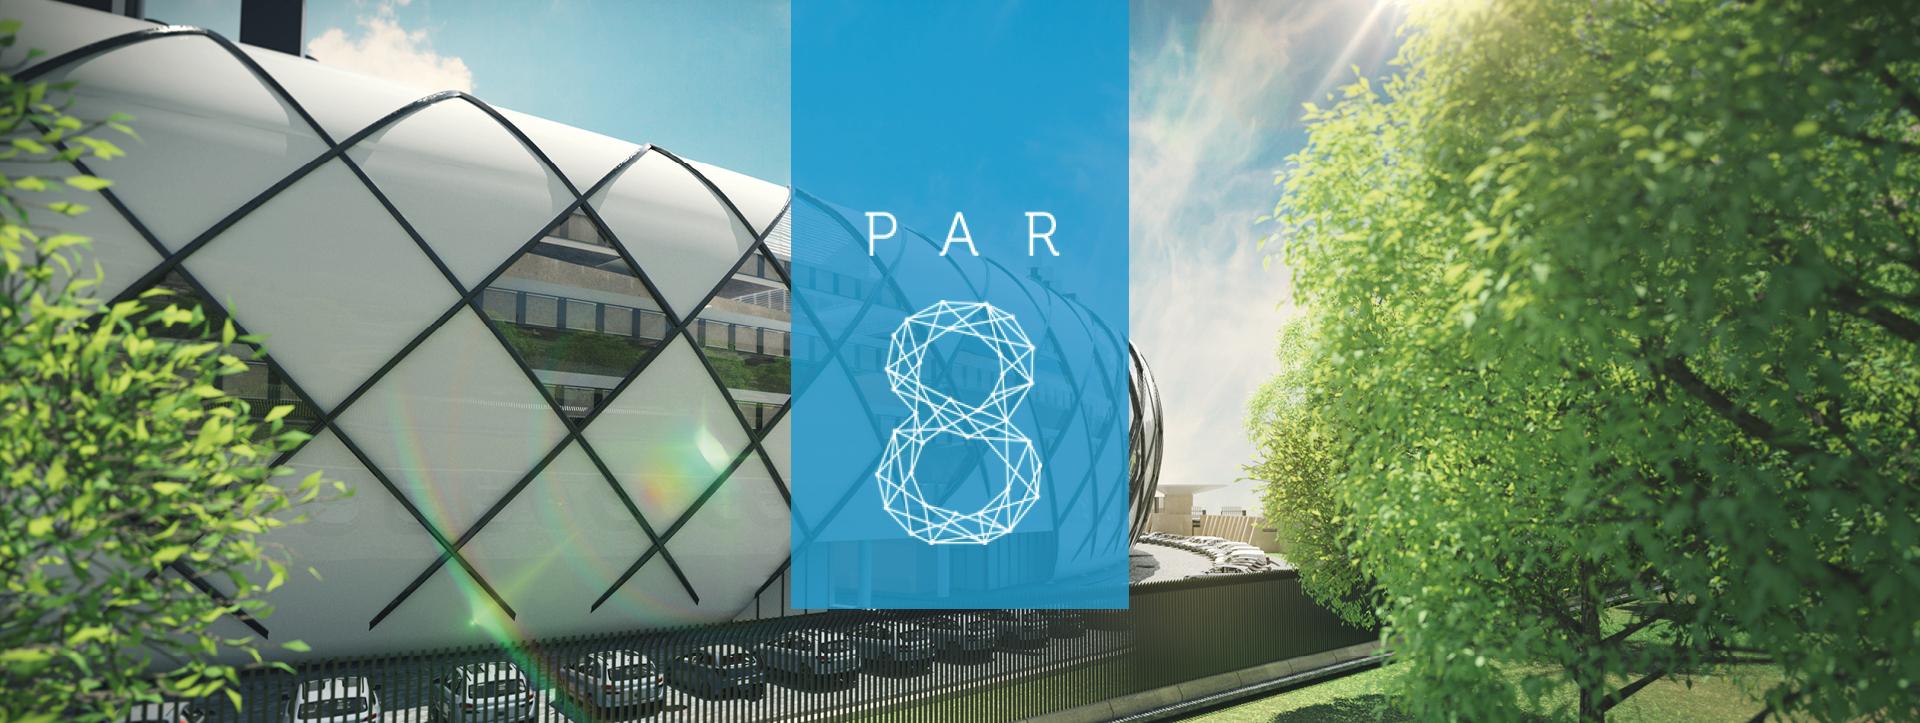 PAR8 Banner